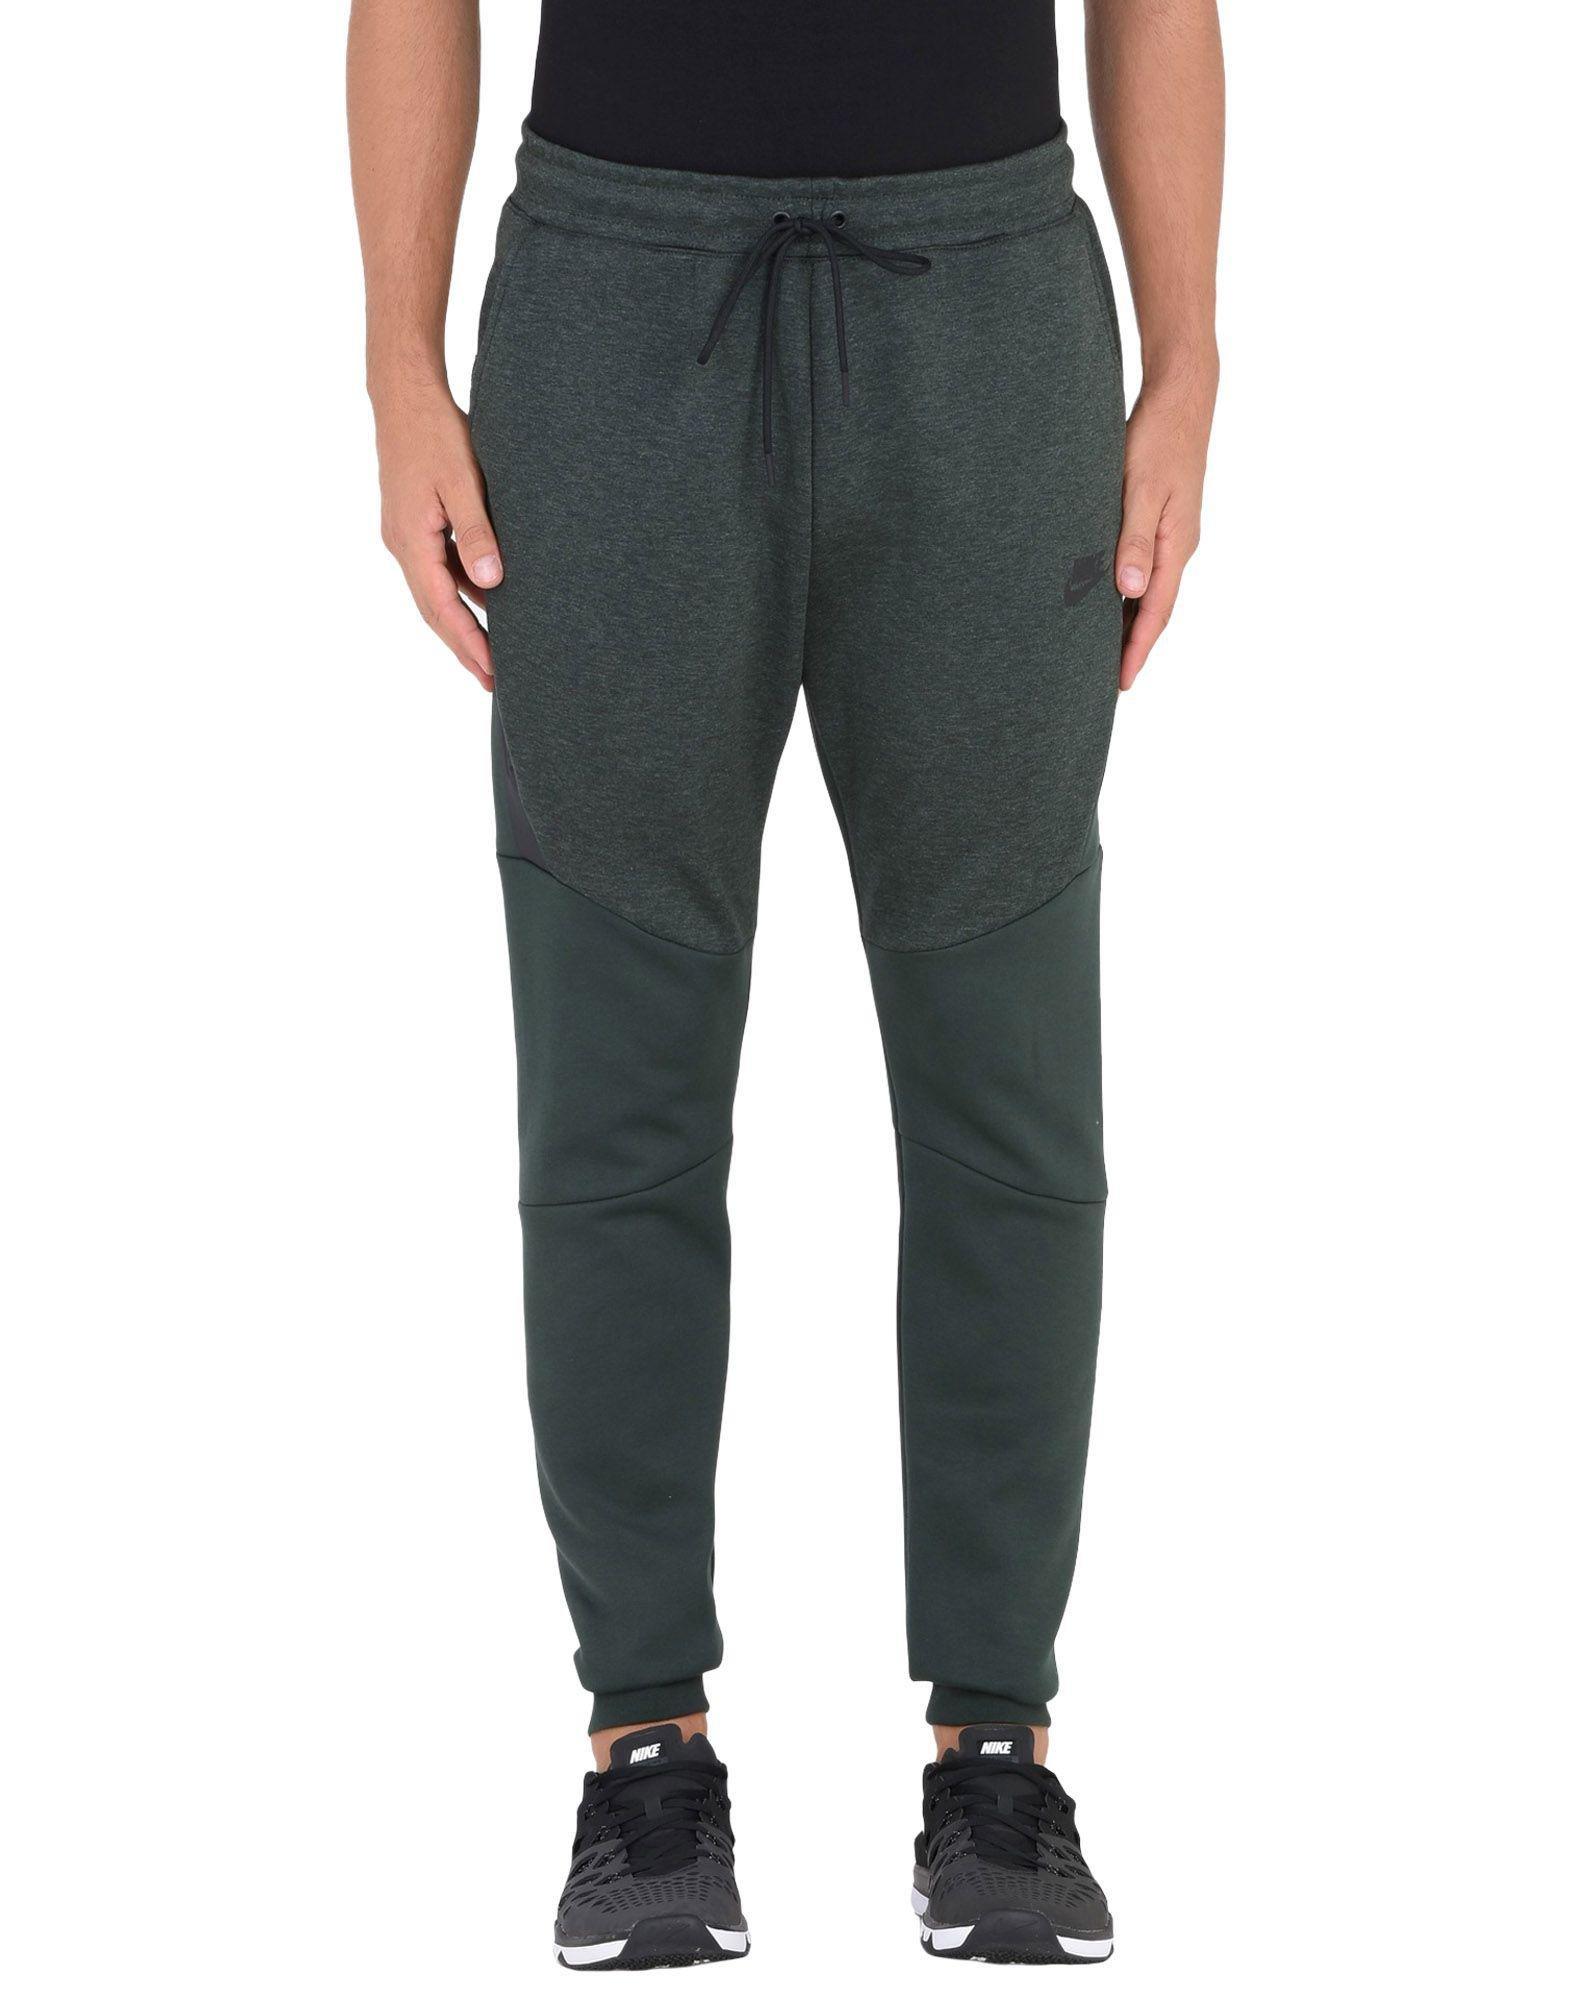 Nike Fleece Casual Trouser in Dark Green (Green) for Men